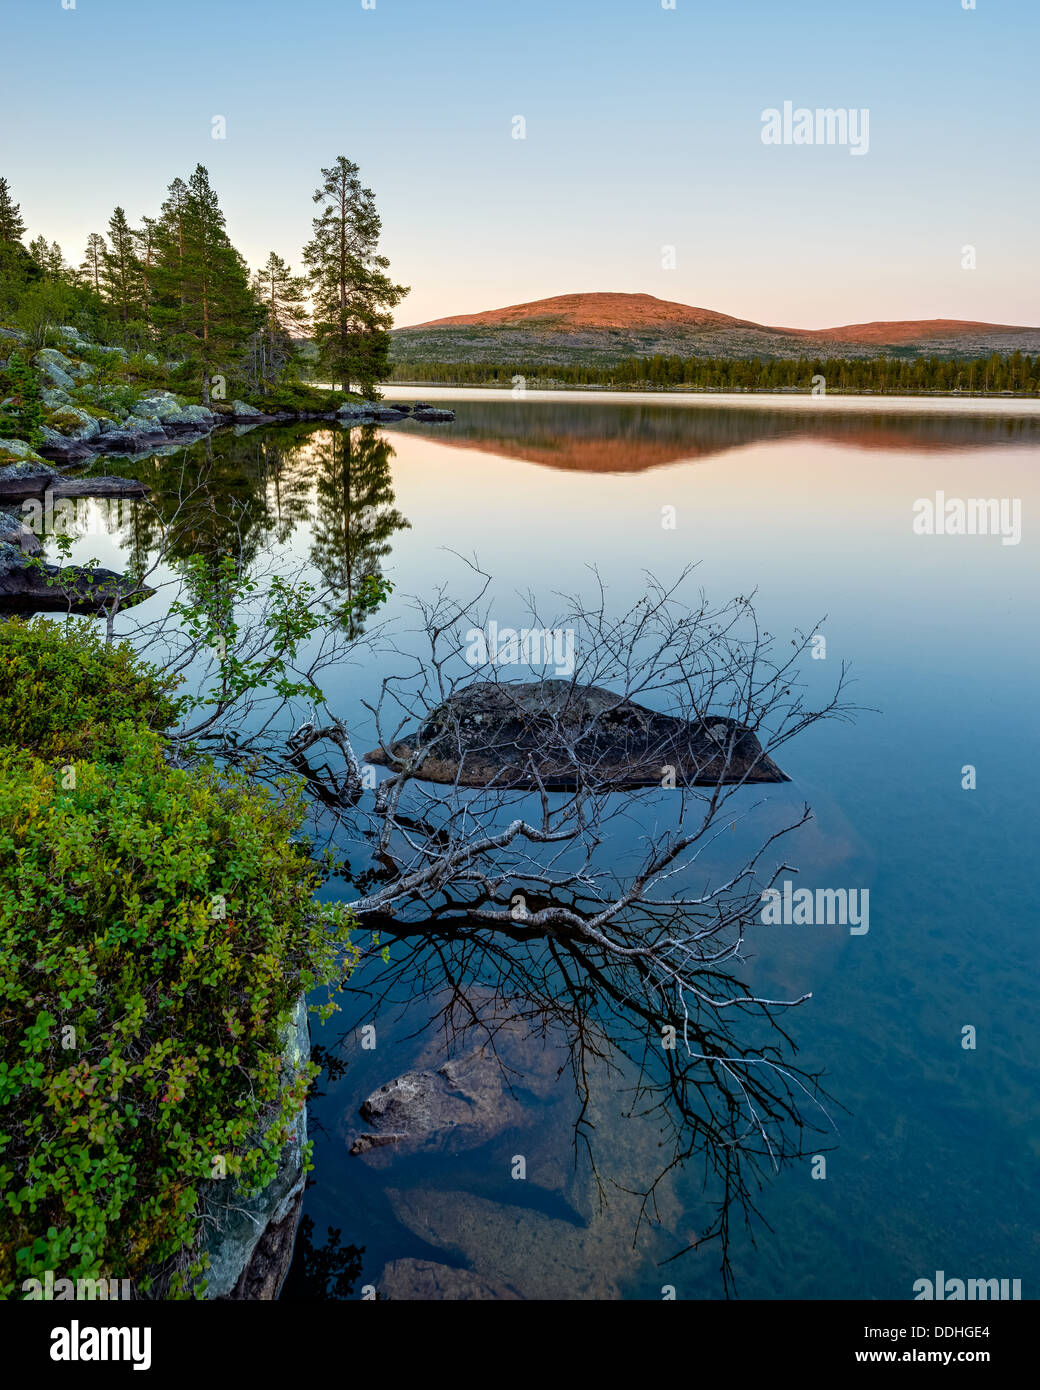 Lake at sunrise, Dalarna, Sweden - Stock Image